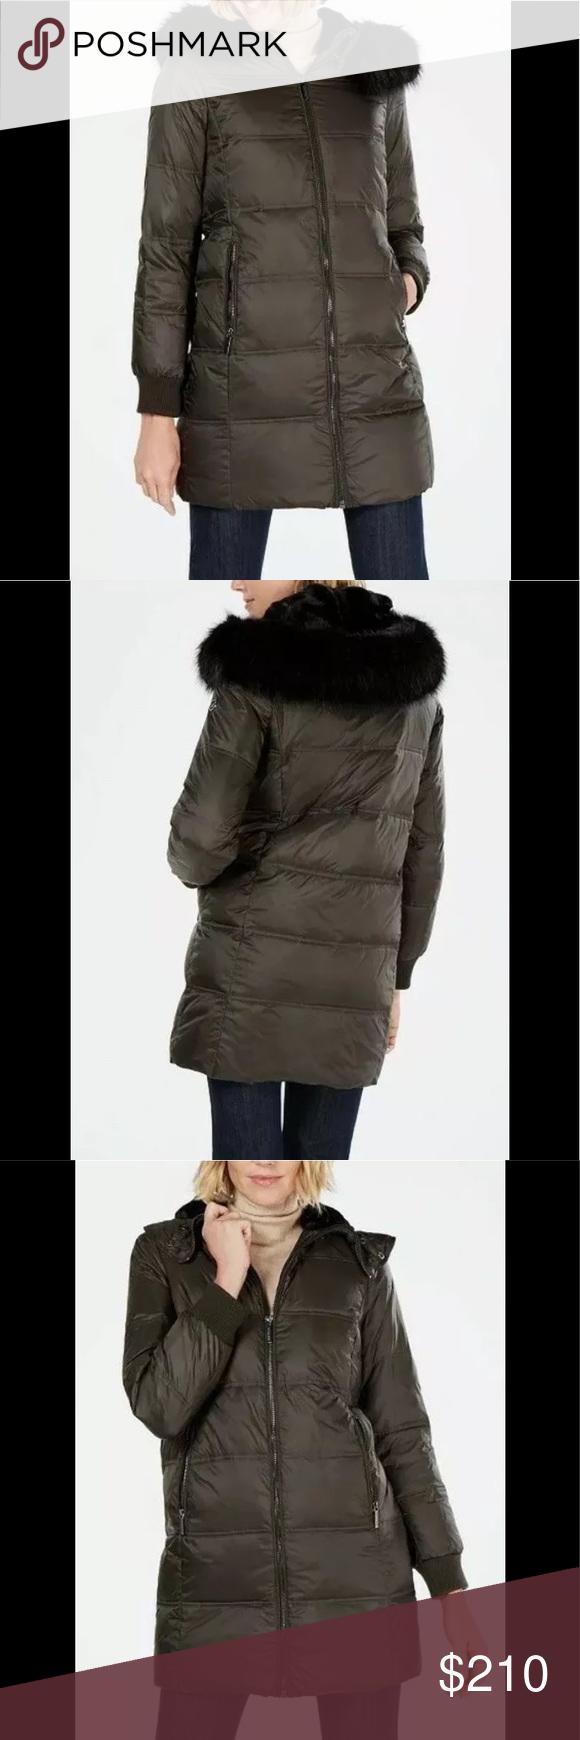 Michael Kors Hooded Puffer Jacket Dark Olive M Faux Fur Hood Michael Kors Jackets Michael Kors [ 1740 x 580 Pixel ]